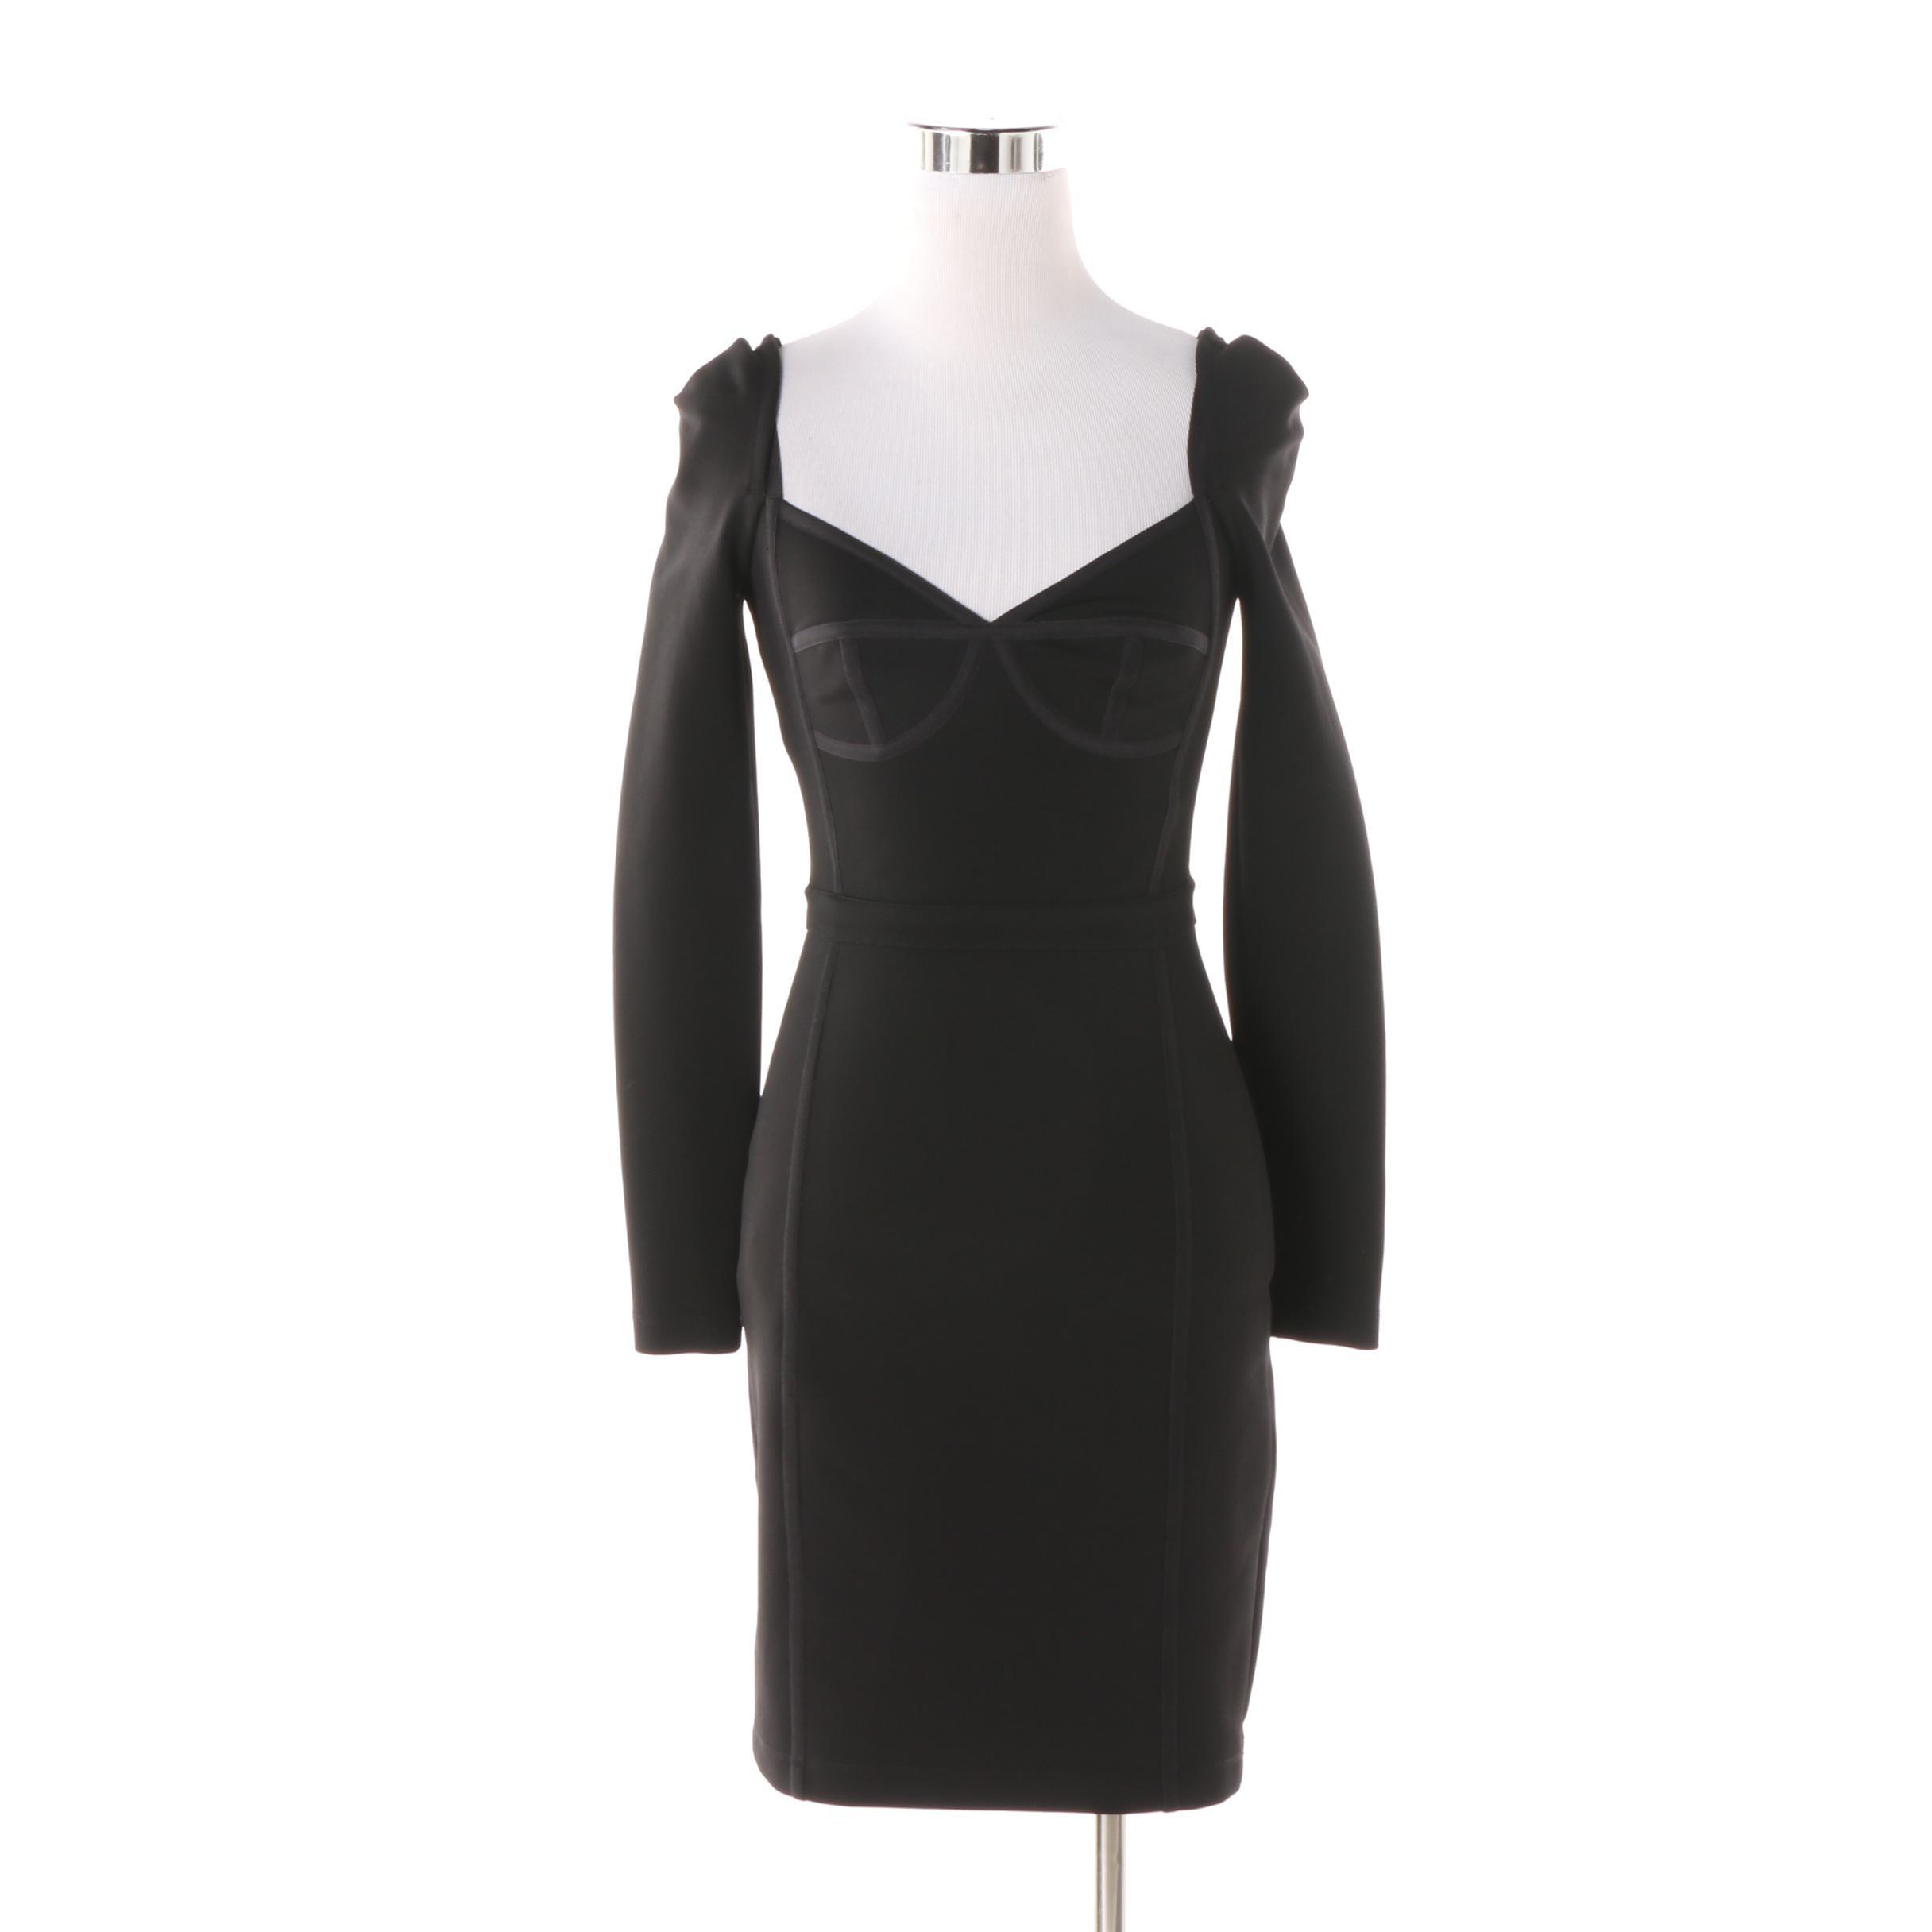 T by Alexander Wang Black Corset Bodycon Dress